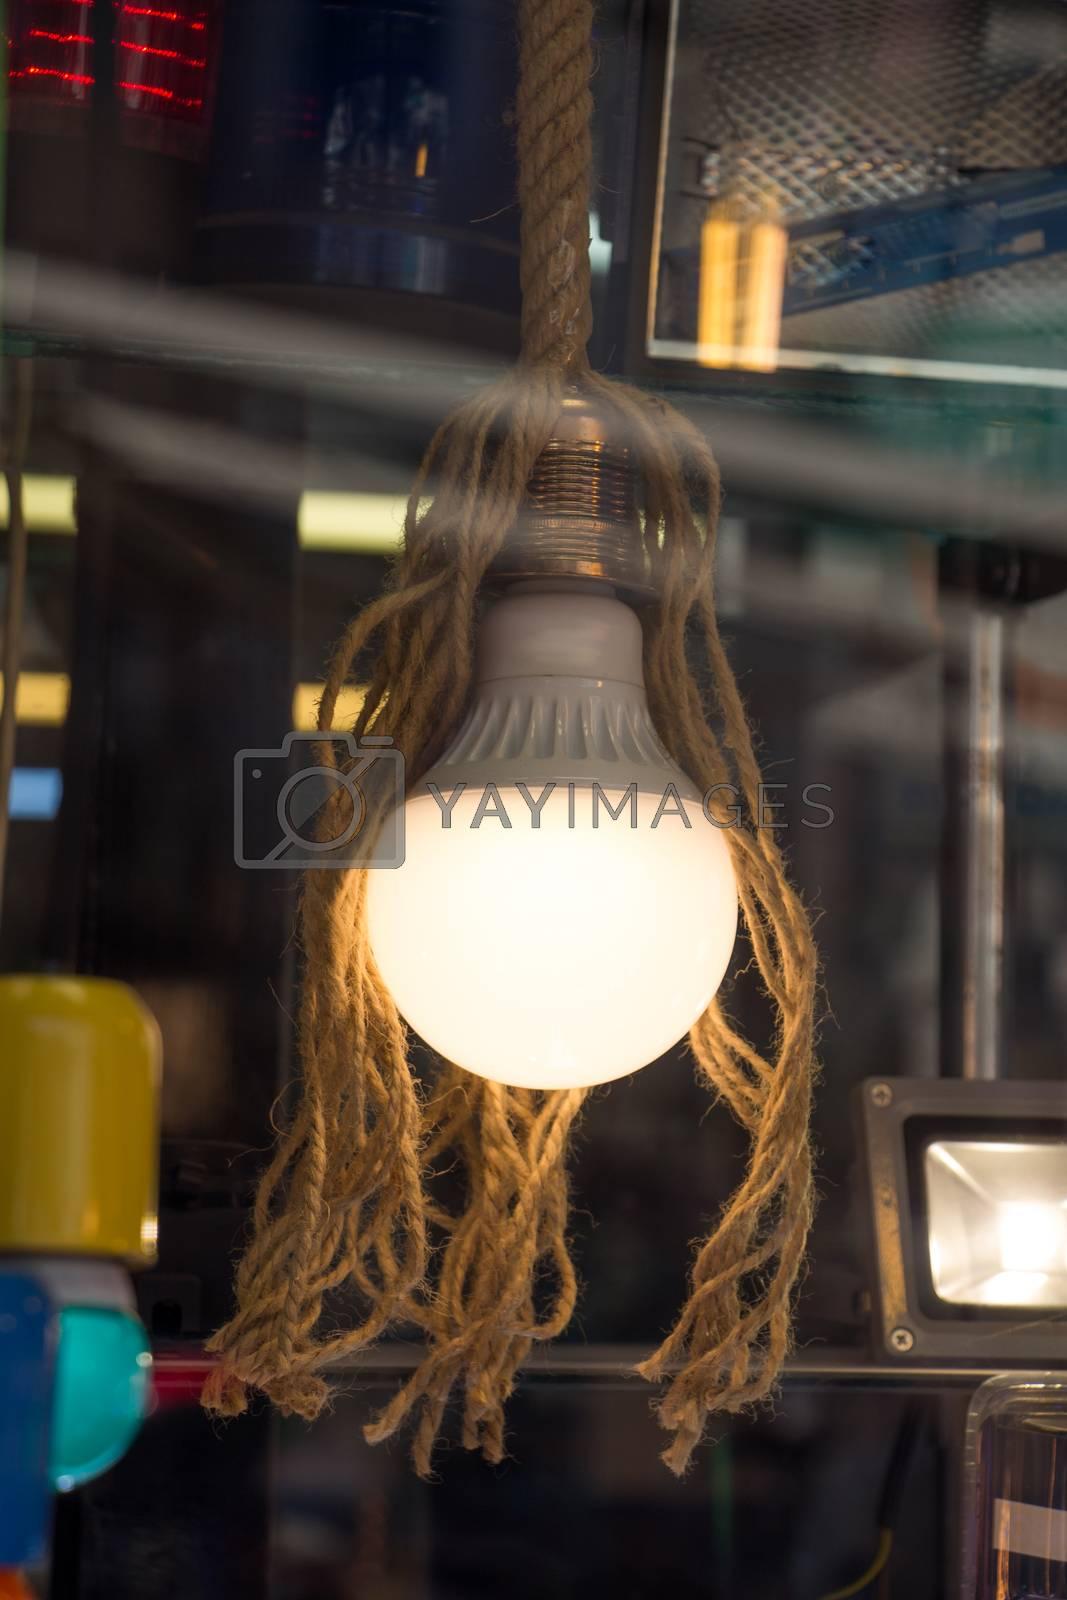 Decorative antique edison style filament light bulbs hanging